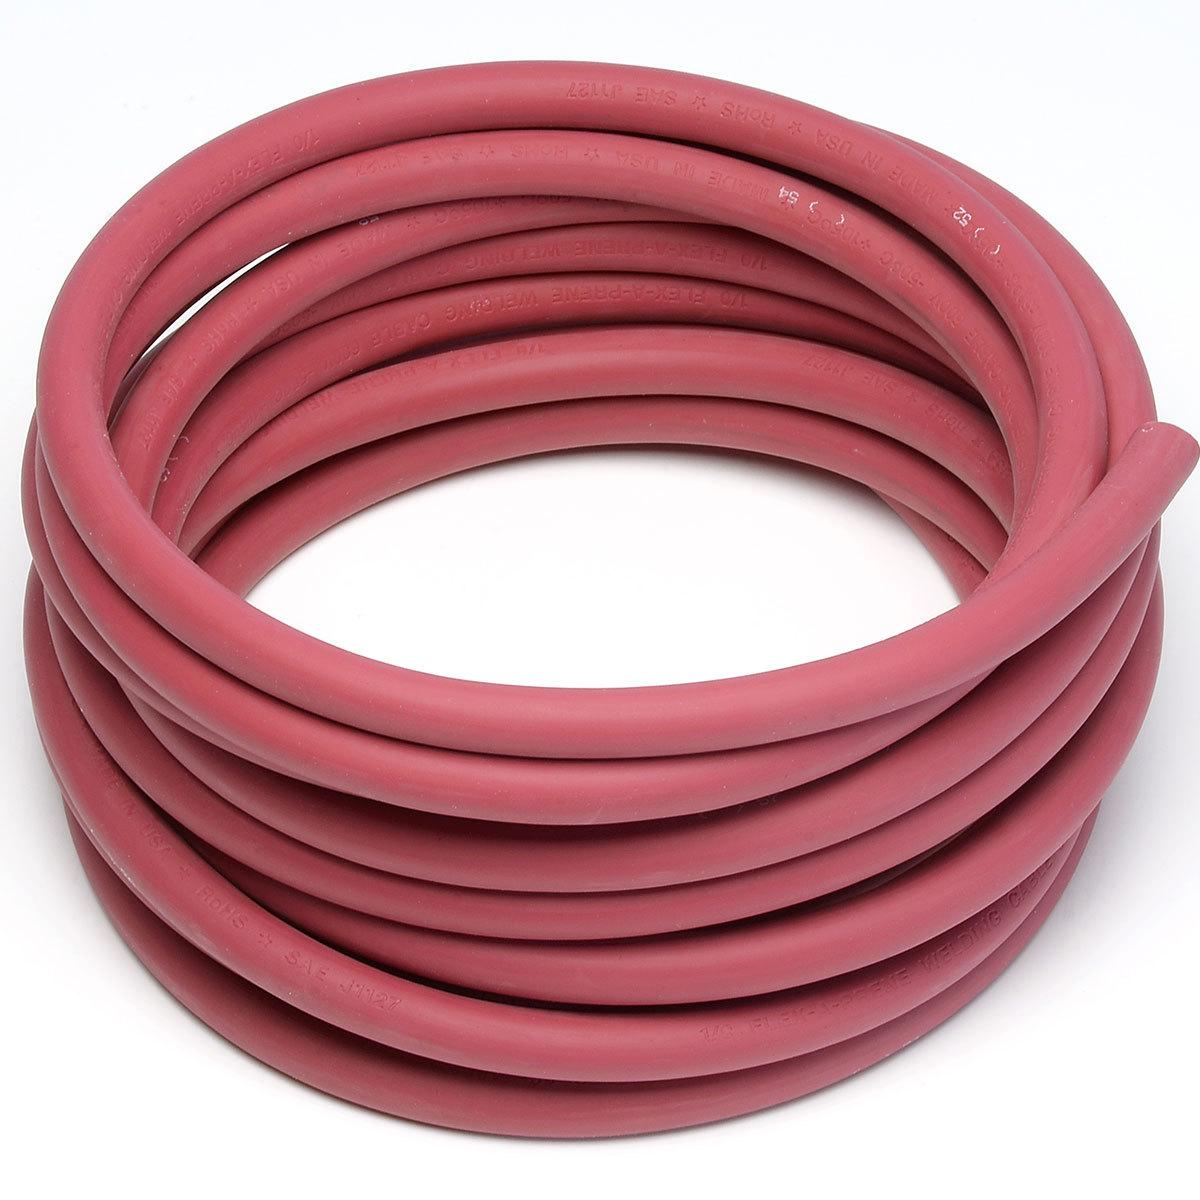 Airgas - DIRFP2151 - Direct Wire & Cable 2/0 Red Flex-A-Prene ...